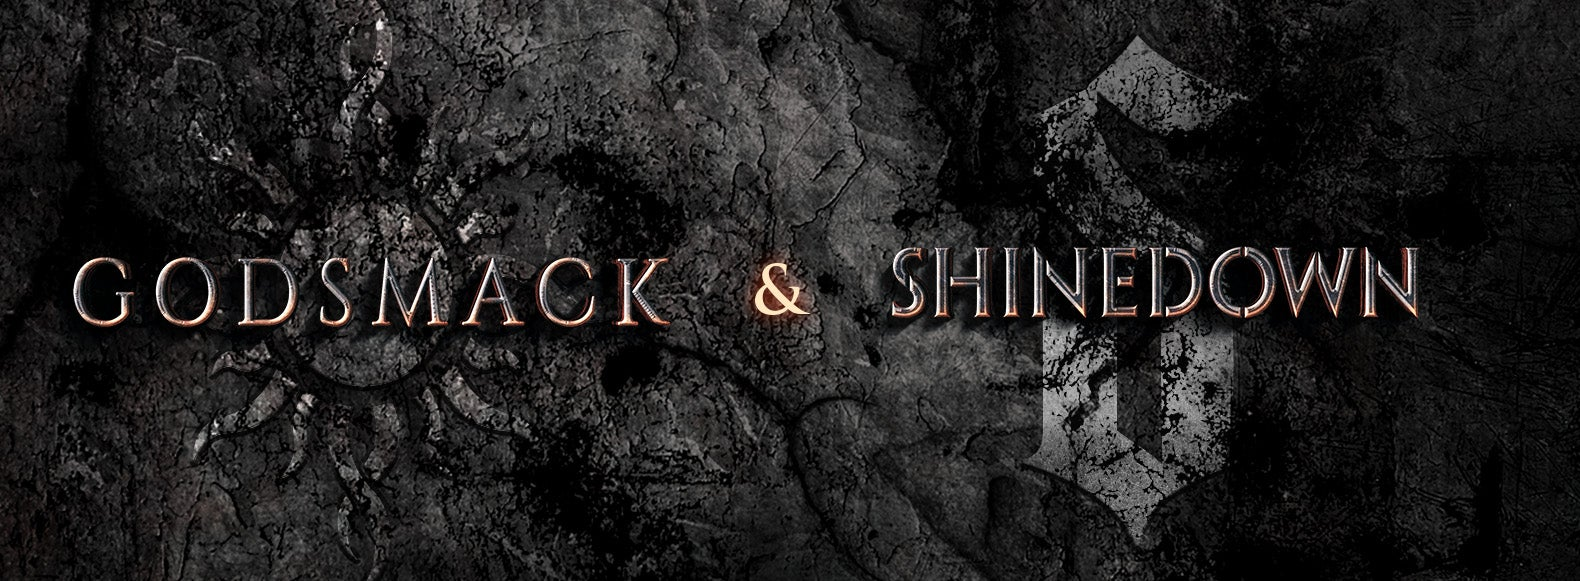 Godsmack Shinedown Bon Secours Wellness Arena